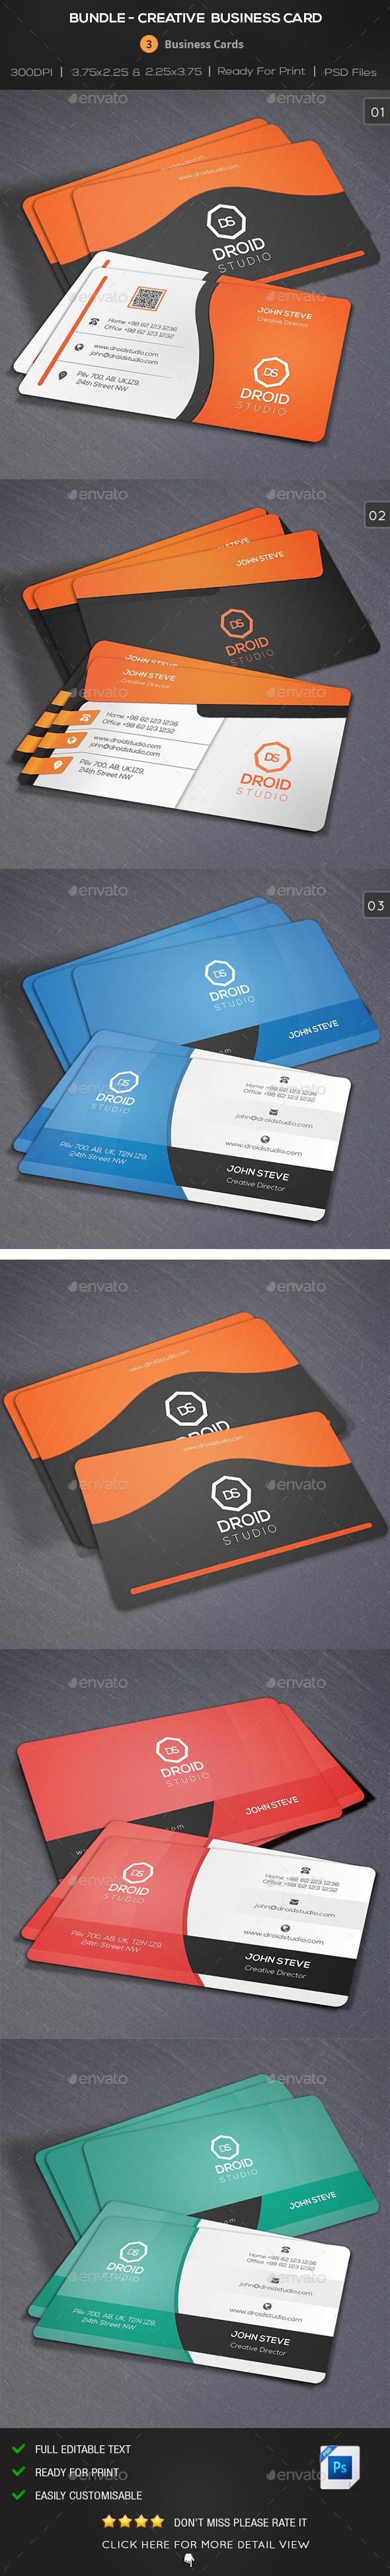 Bundle - Creative Business Card - Creative Business Cards